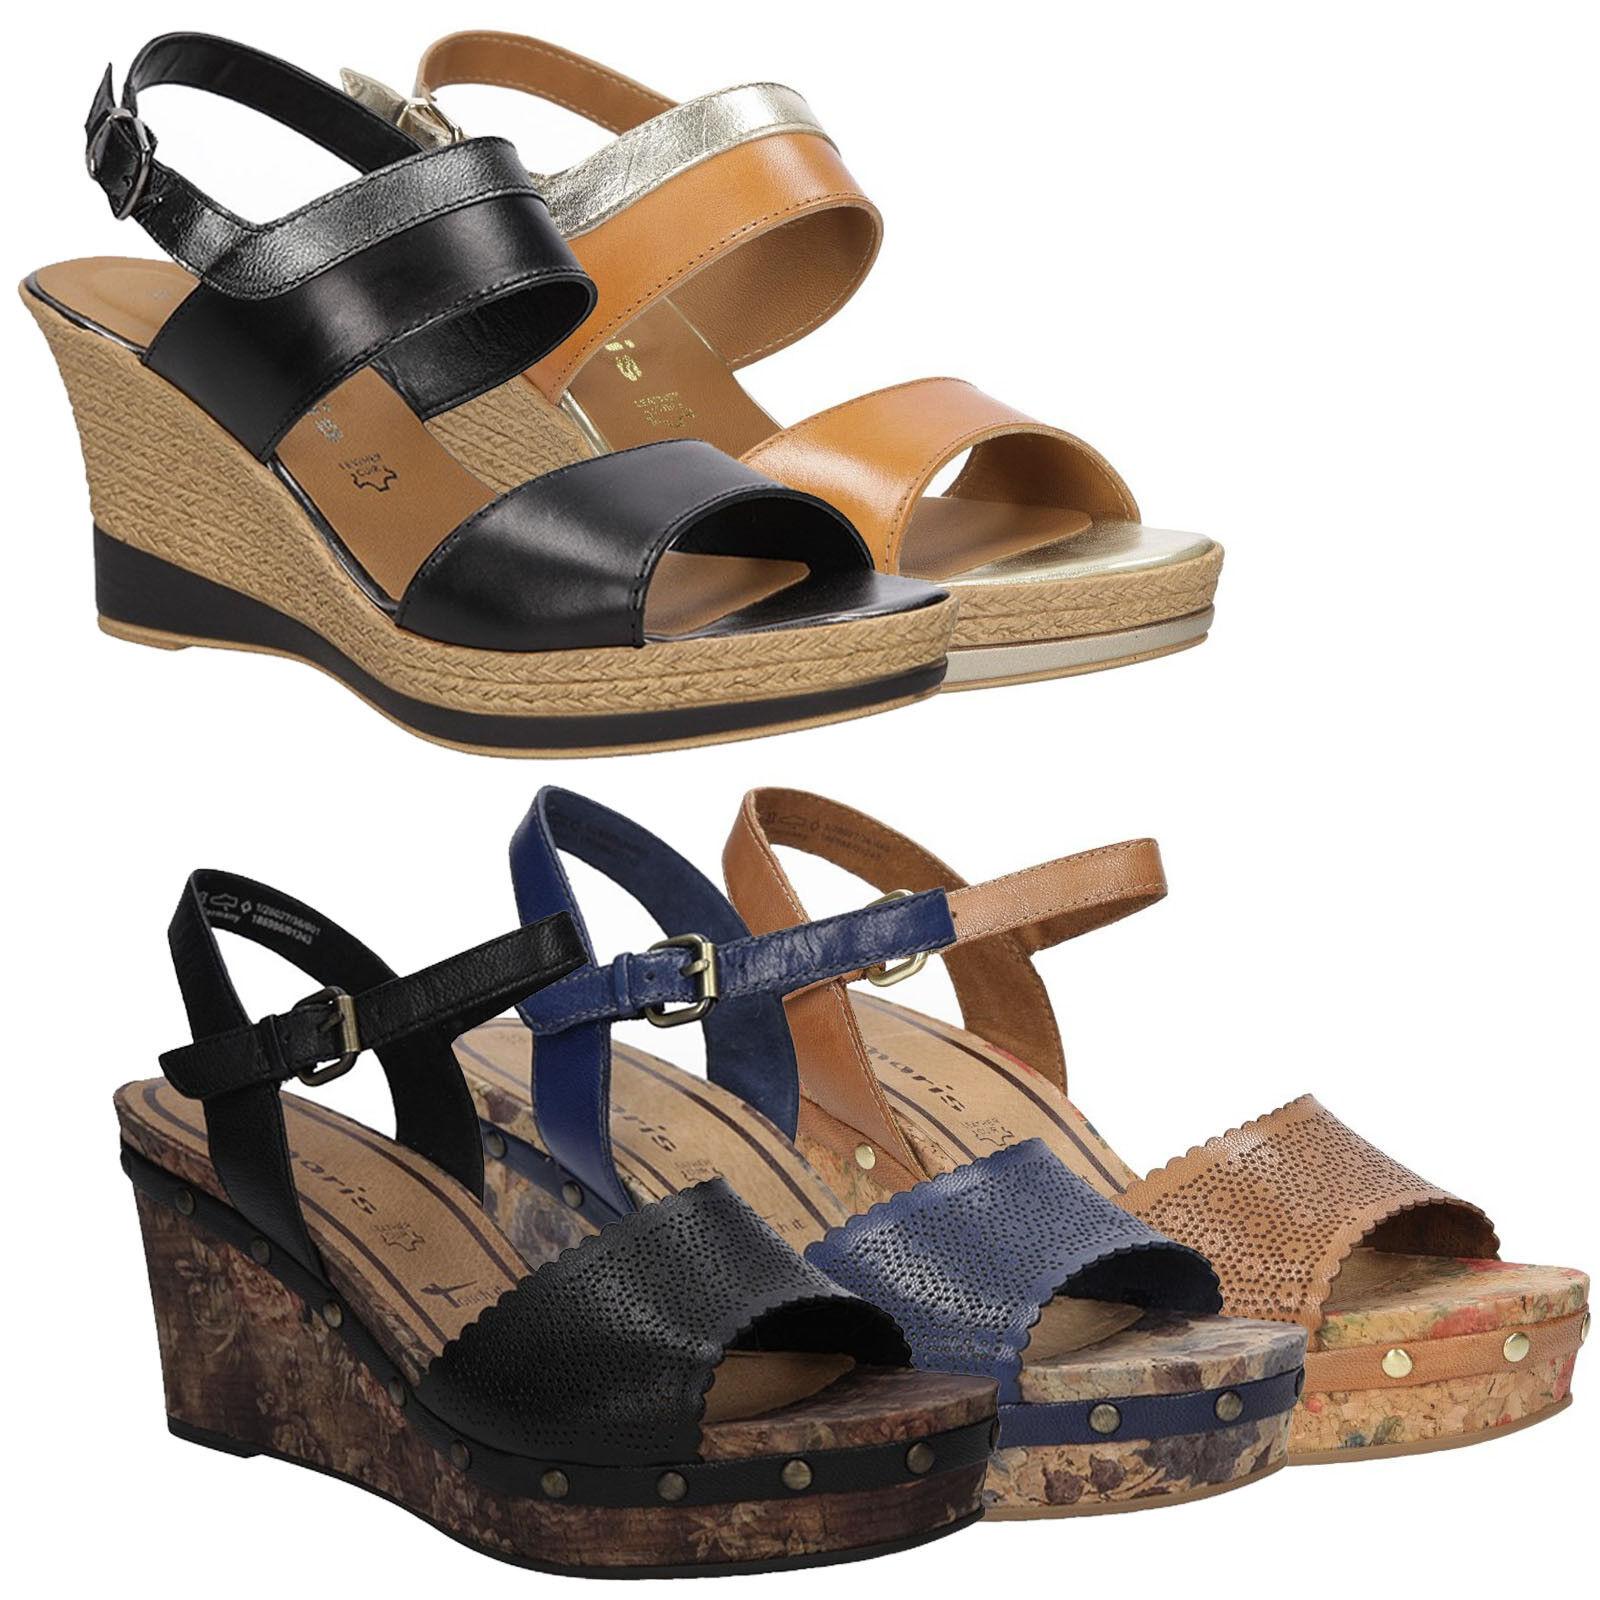 Damen Sandaleetten Tamaris 1-28359-26 Echtleder Schnalle Keilabsatz Gr.35-40 SALE